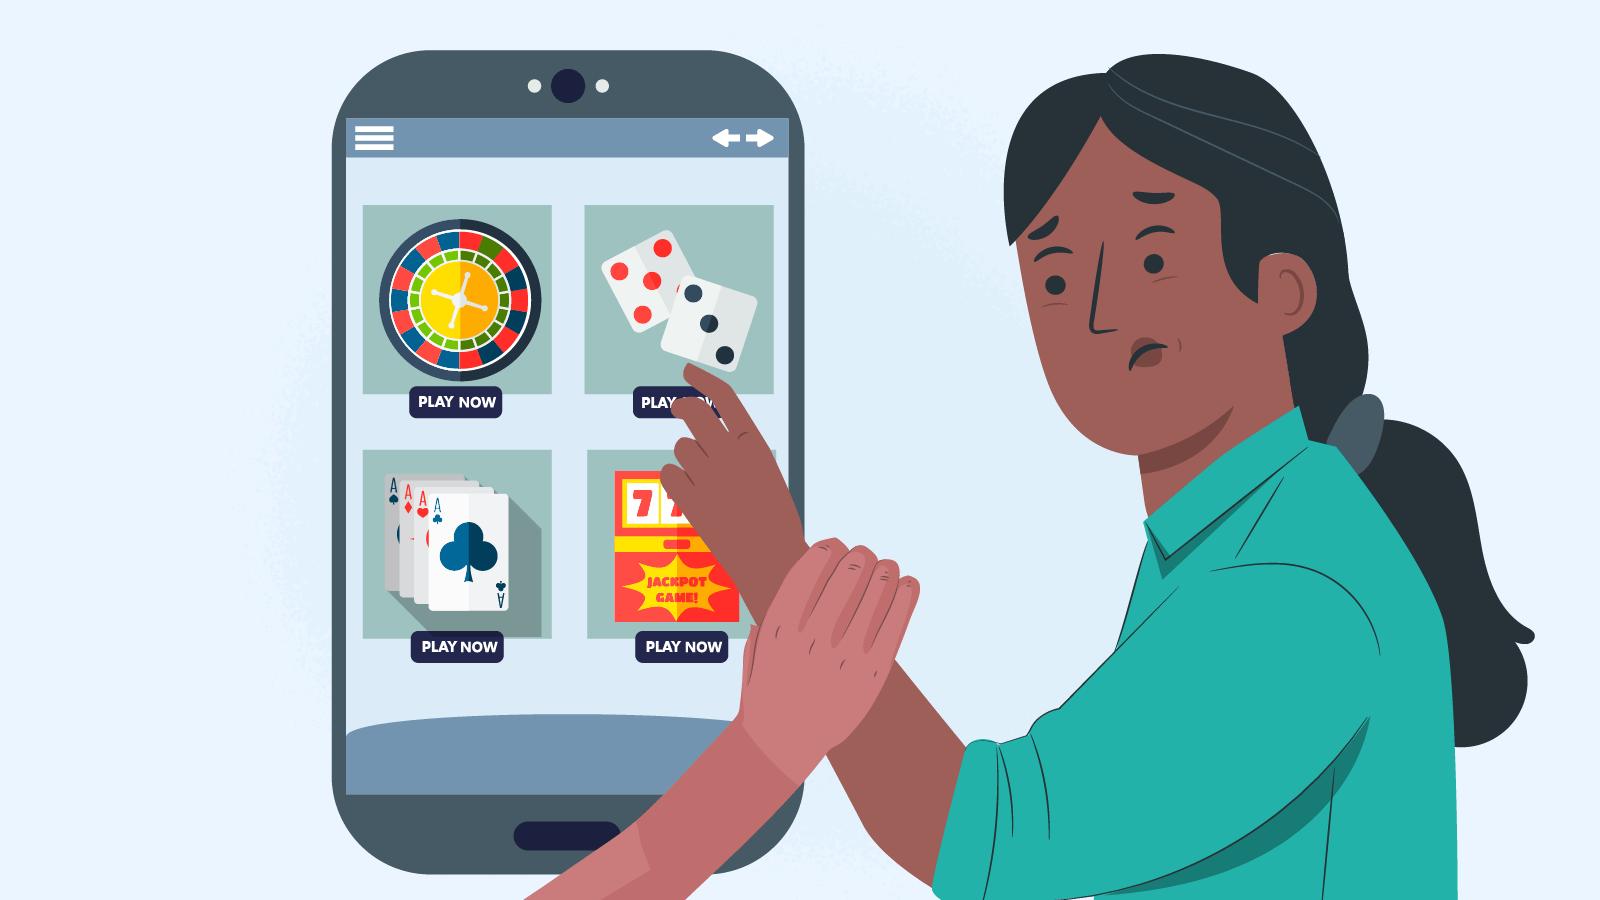 Self Help for gambling addiction